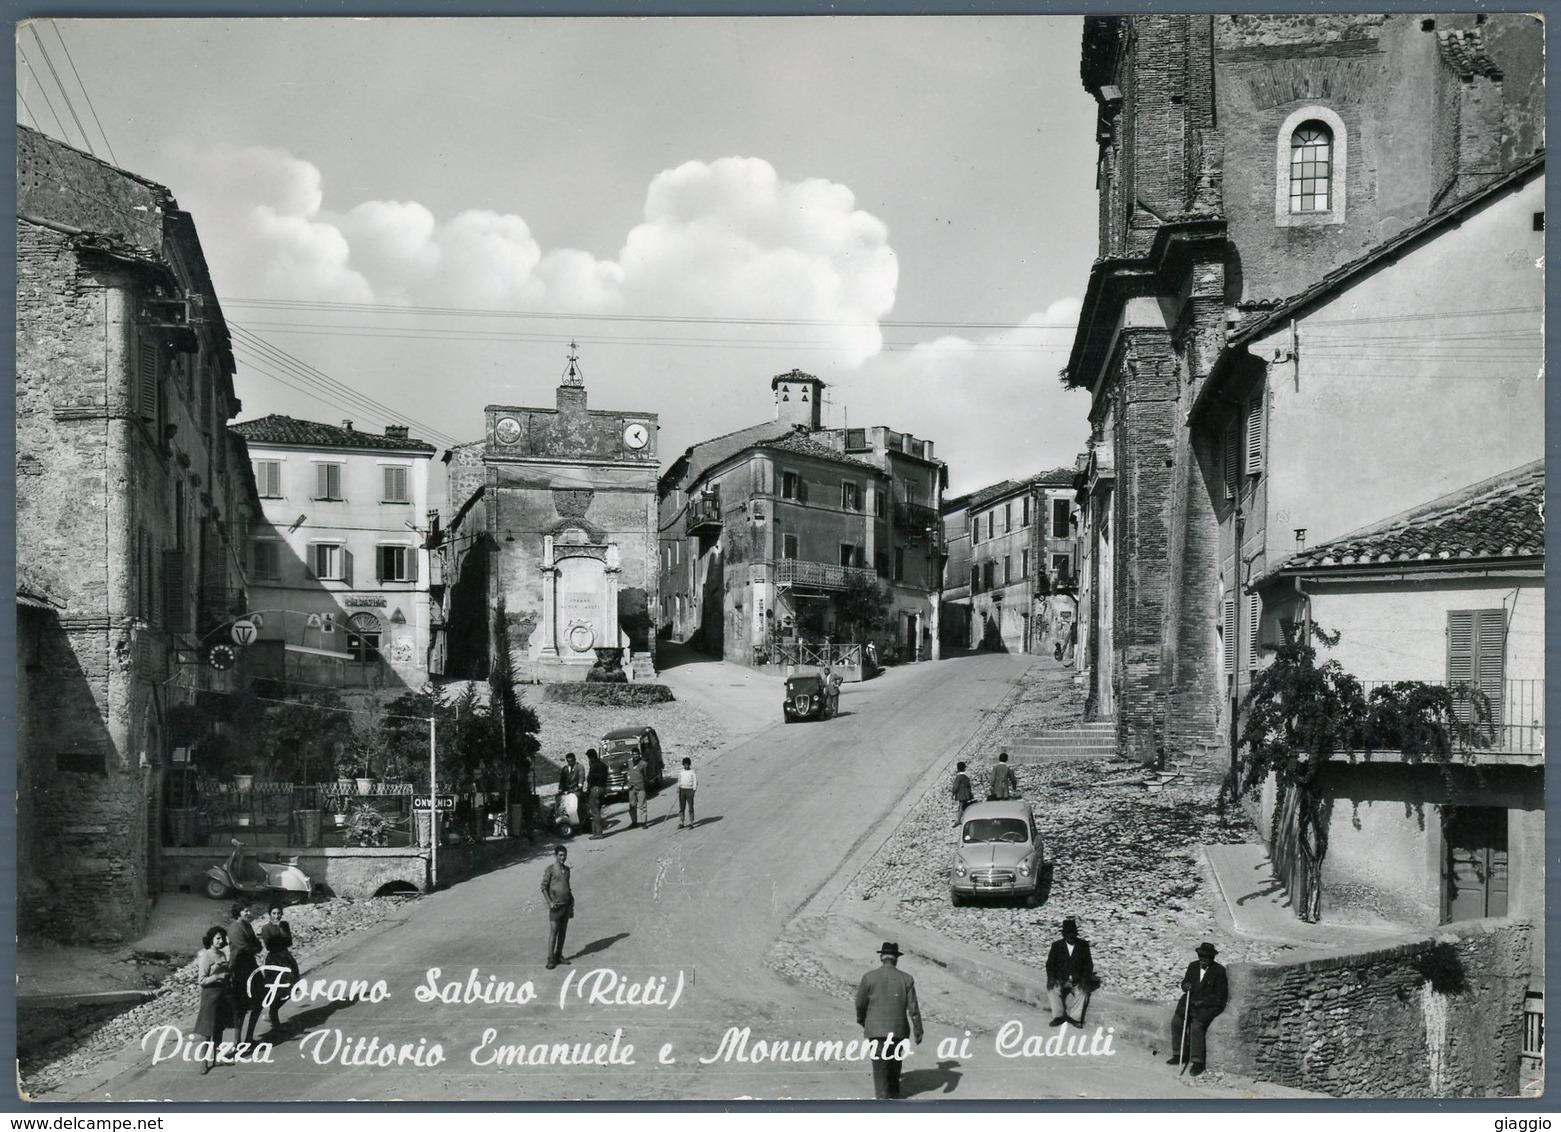 °°° Cartolina N. 64 Forano Sabino Piazza Vittorio Emanuele E Monumento Ai Caduti Viaggiata °°° - Rieti